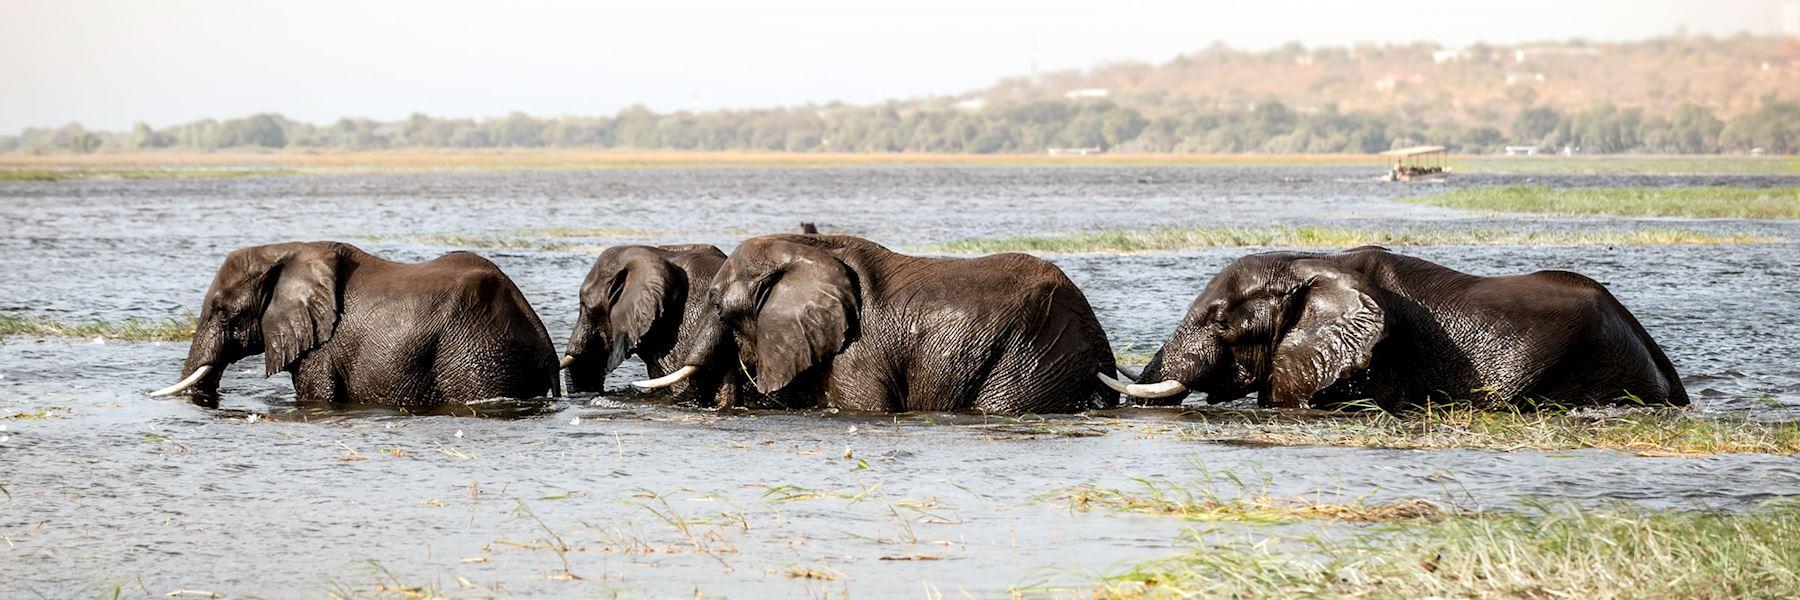 Botswana safaris & vacations